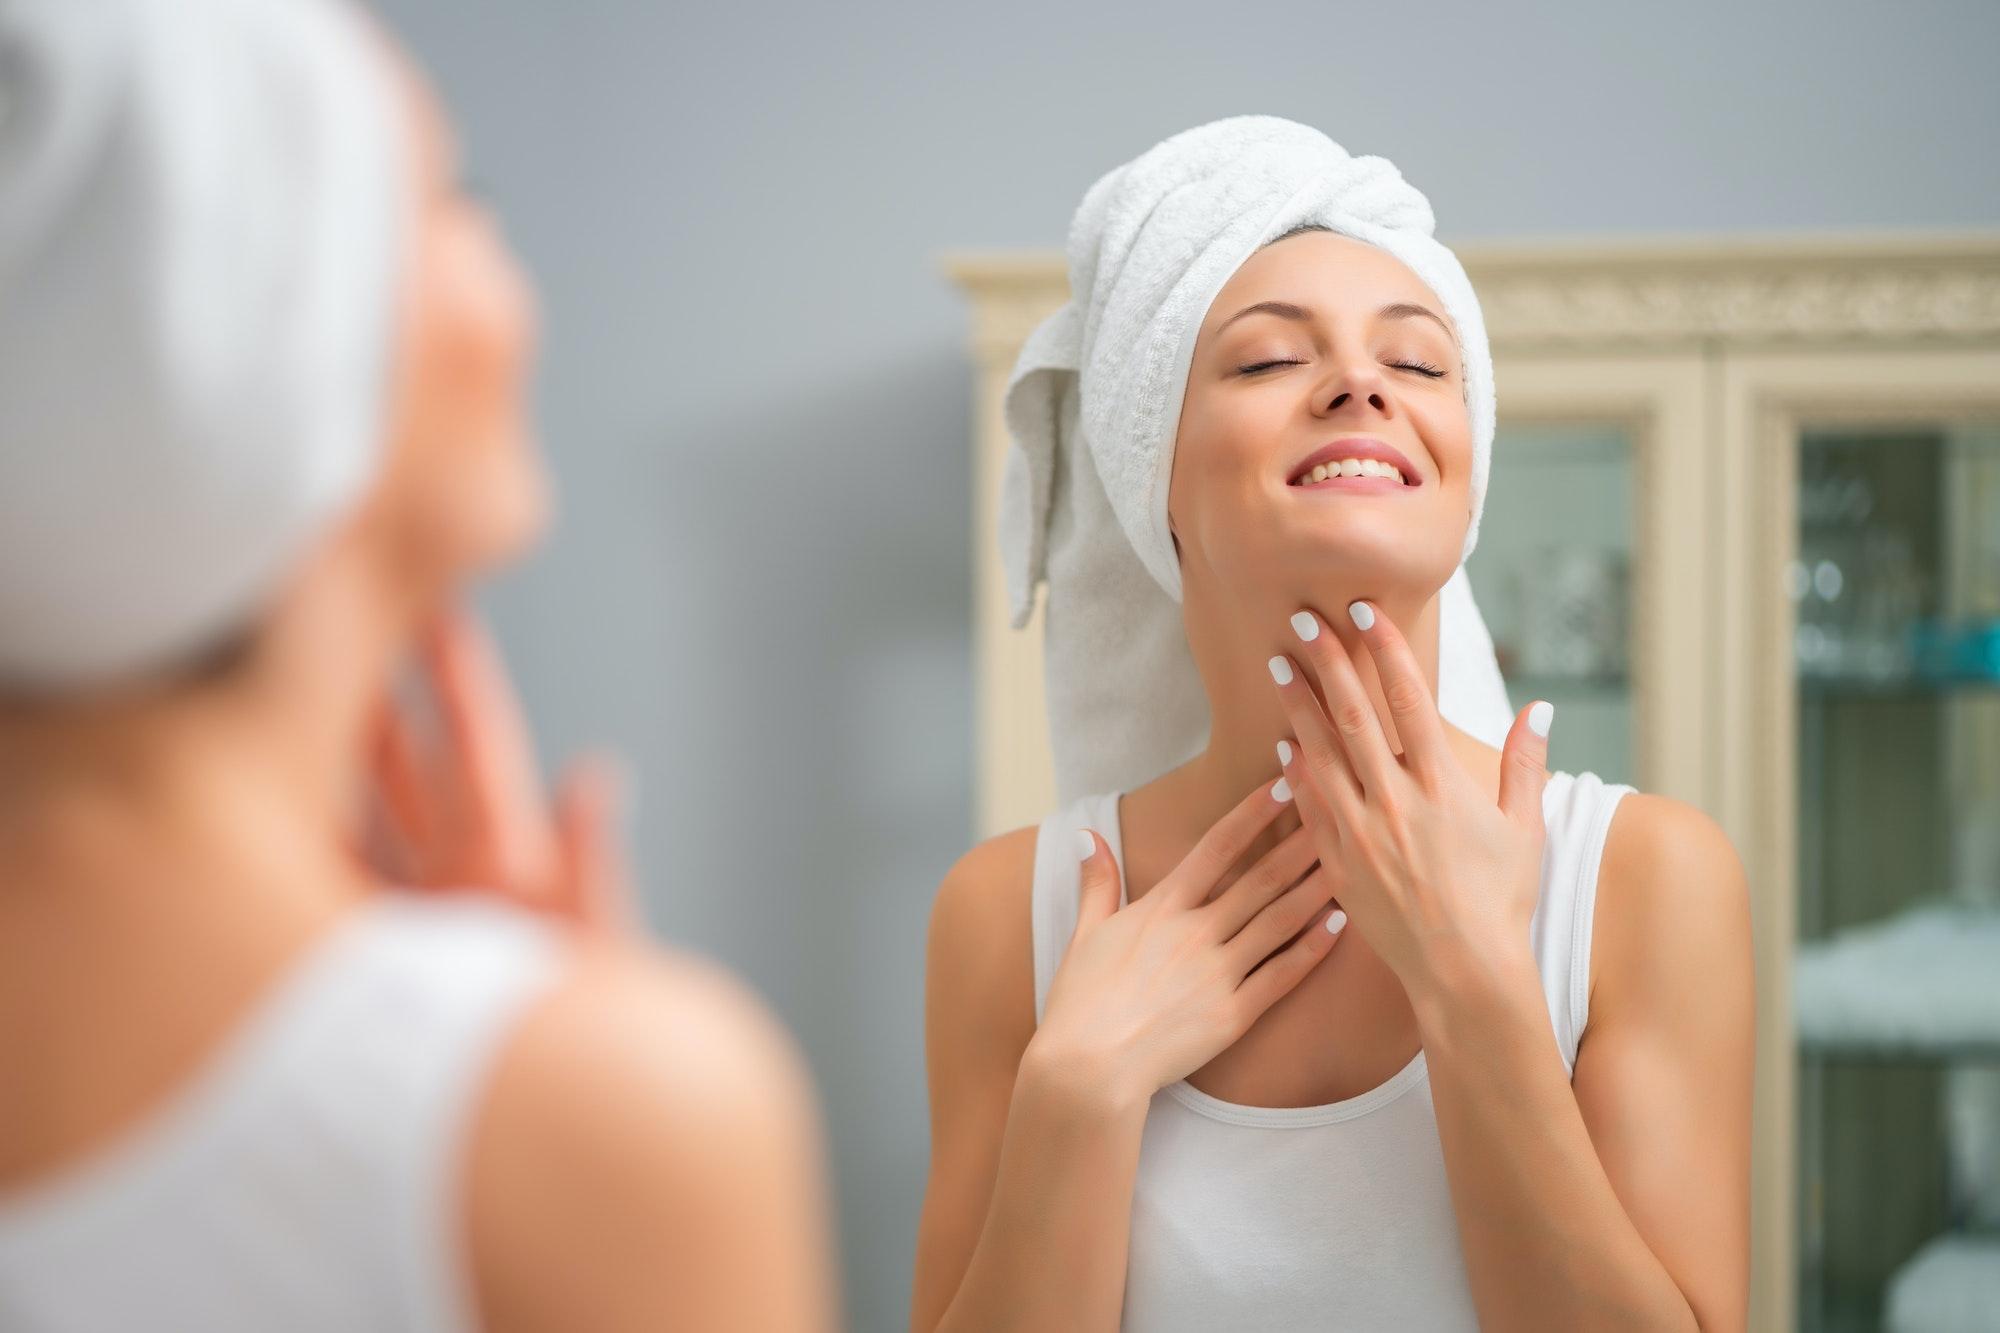 Woman applying moisturizer to her skin